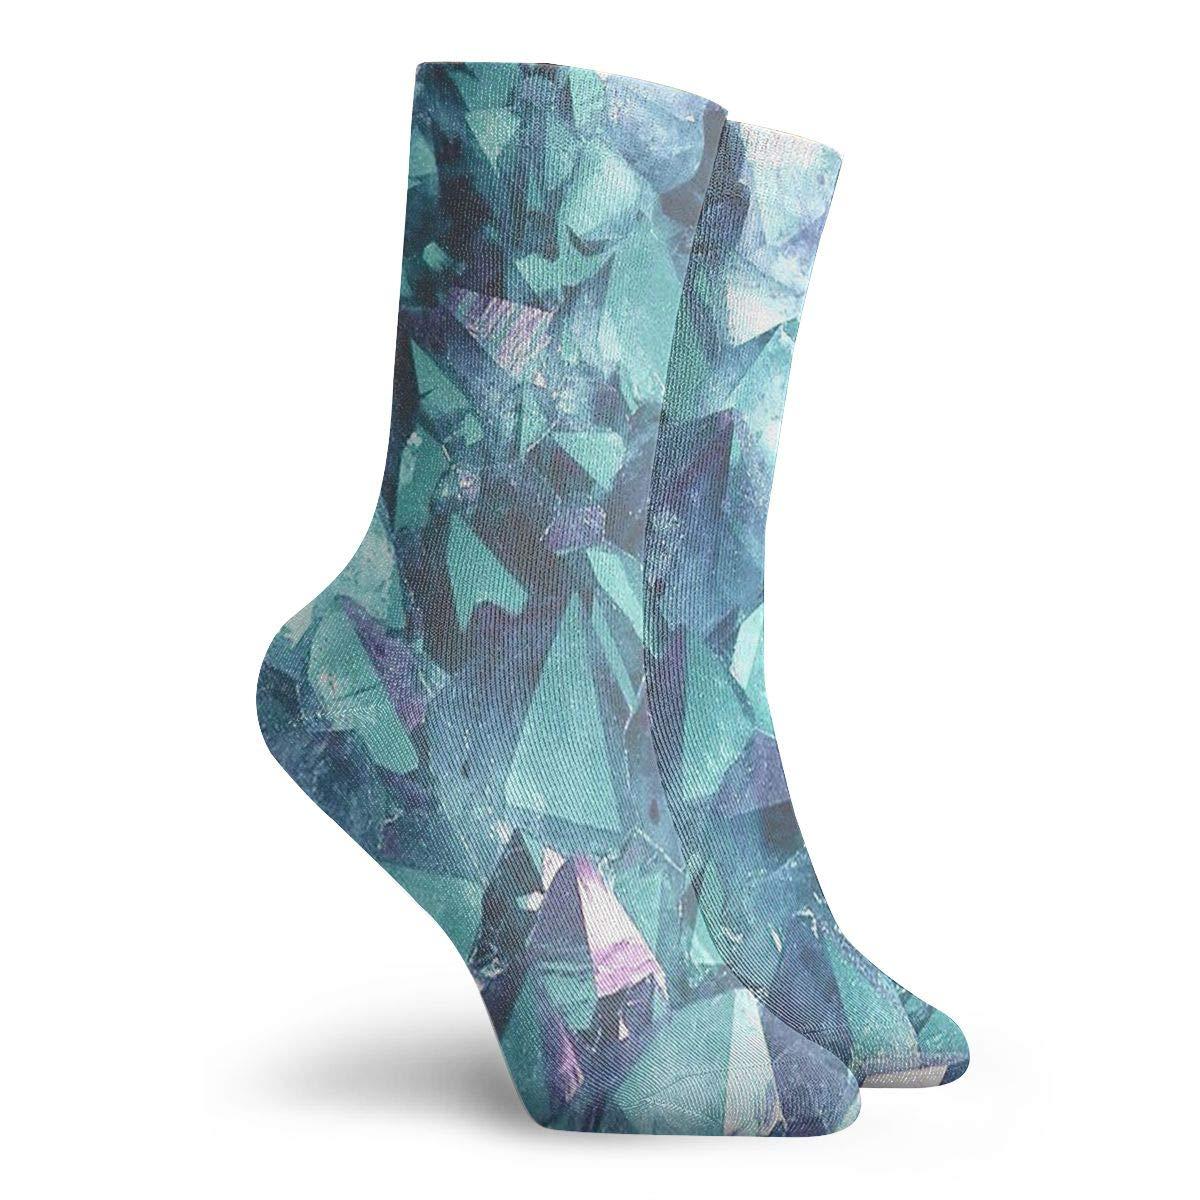 Art Unisex Funny Casual Crew Socks Athletic Socks For Boys Girls Kids Teenagers